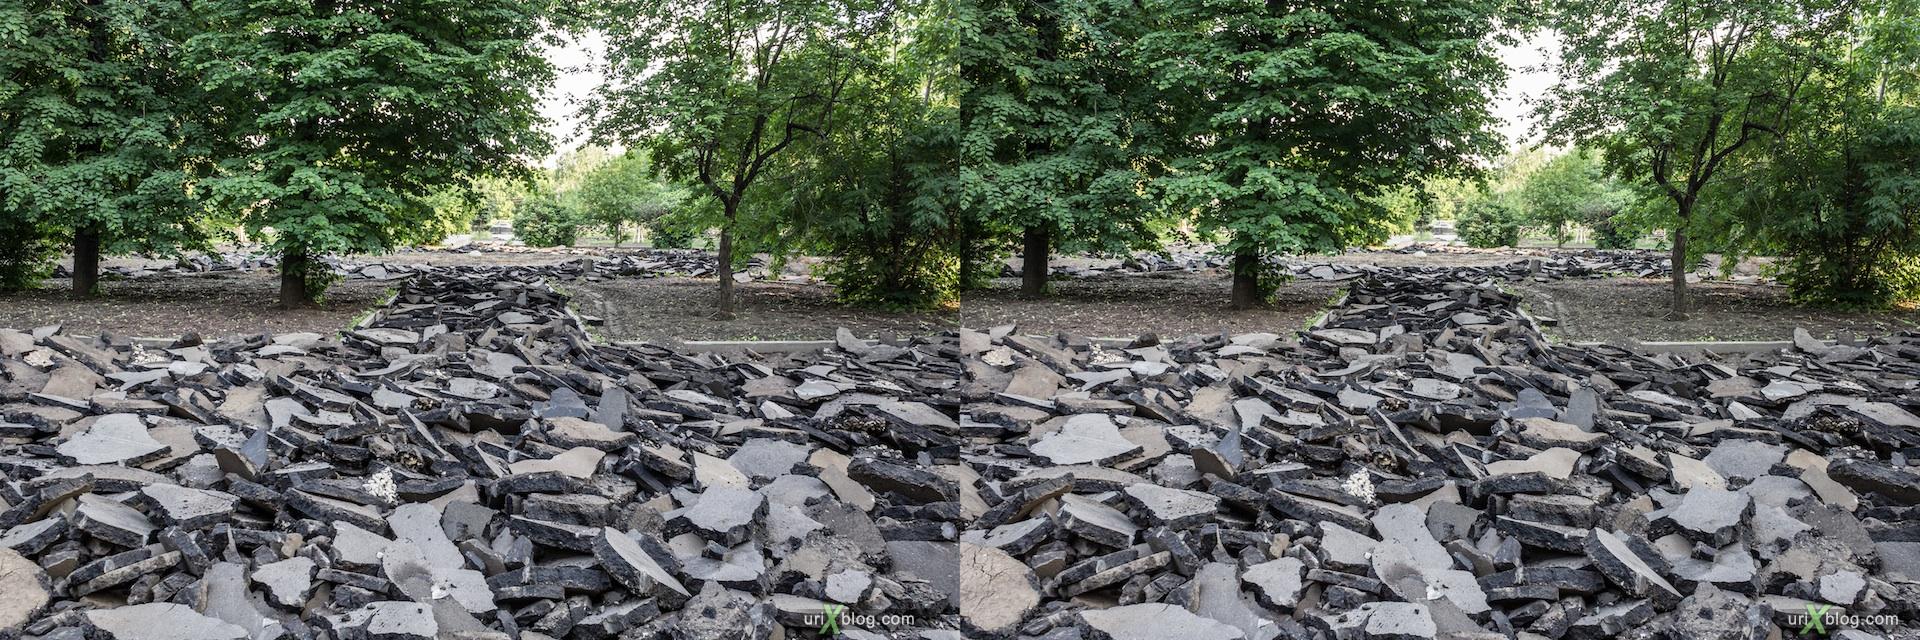 2013, Vojkovskaya, asphalt, park, trees, Moscow, Russia, 3D, stereo pair, cross-eyed, crossview, cross view stereo pair, stereoscopic